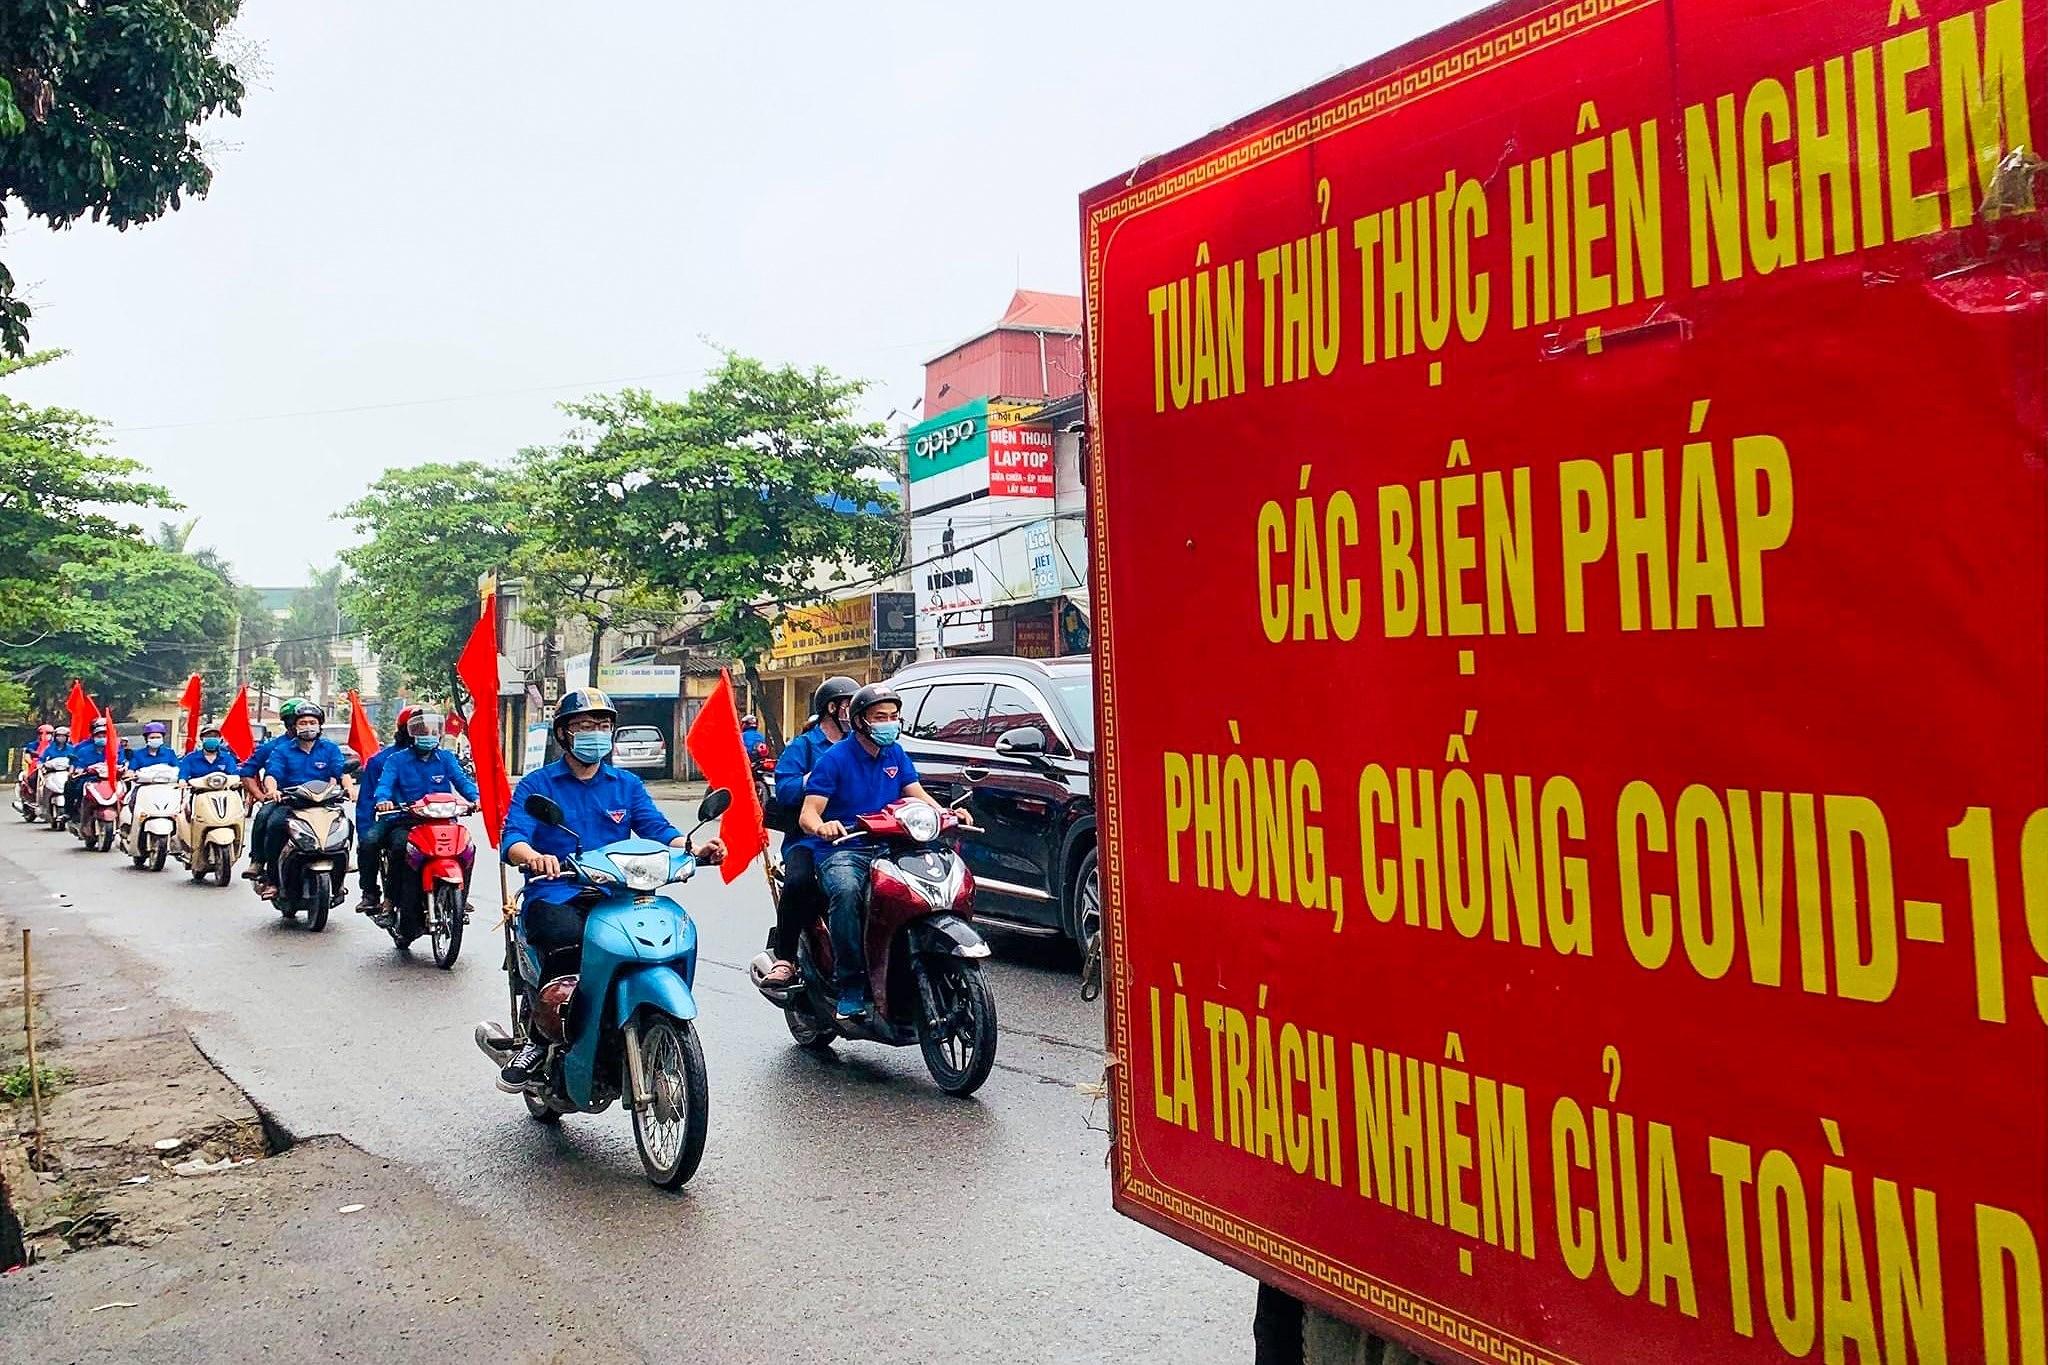 Cach lam sang tao cua Thanh doan Ha Noi truoc ngay bau cu toan quoc hinh anh 10